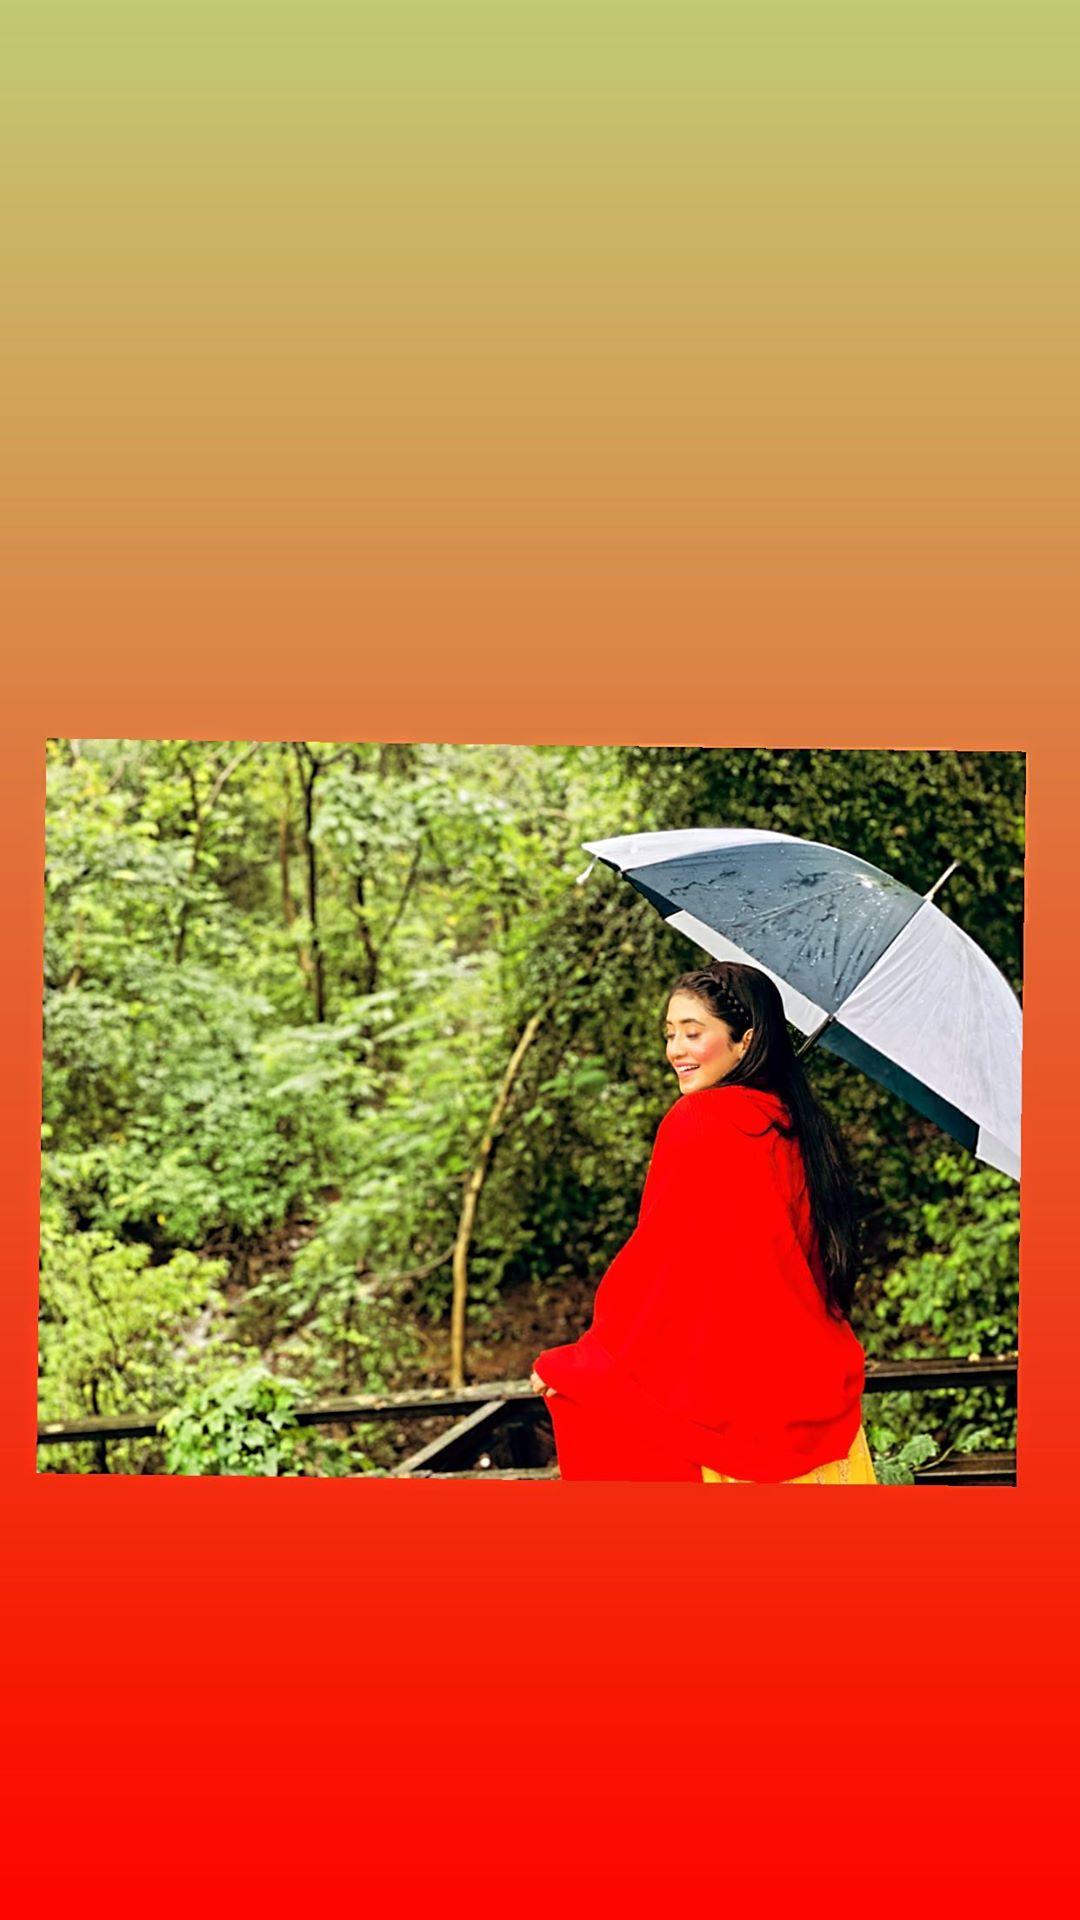 Have you seen Yeh Rishta Kya Kehlata Hai actress Shivangi Joshi's pretty pictures yet?